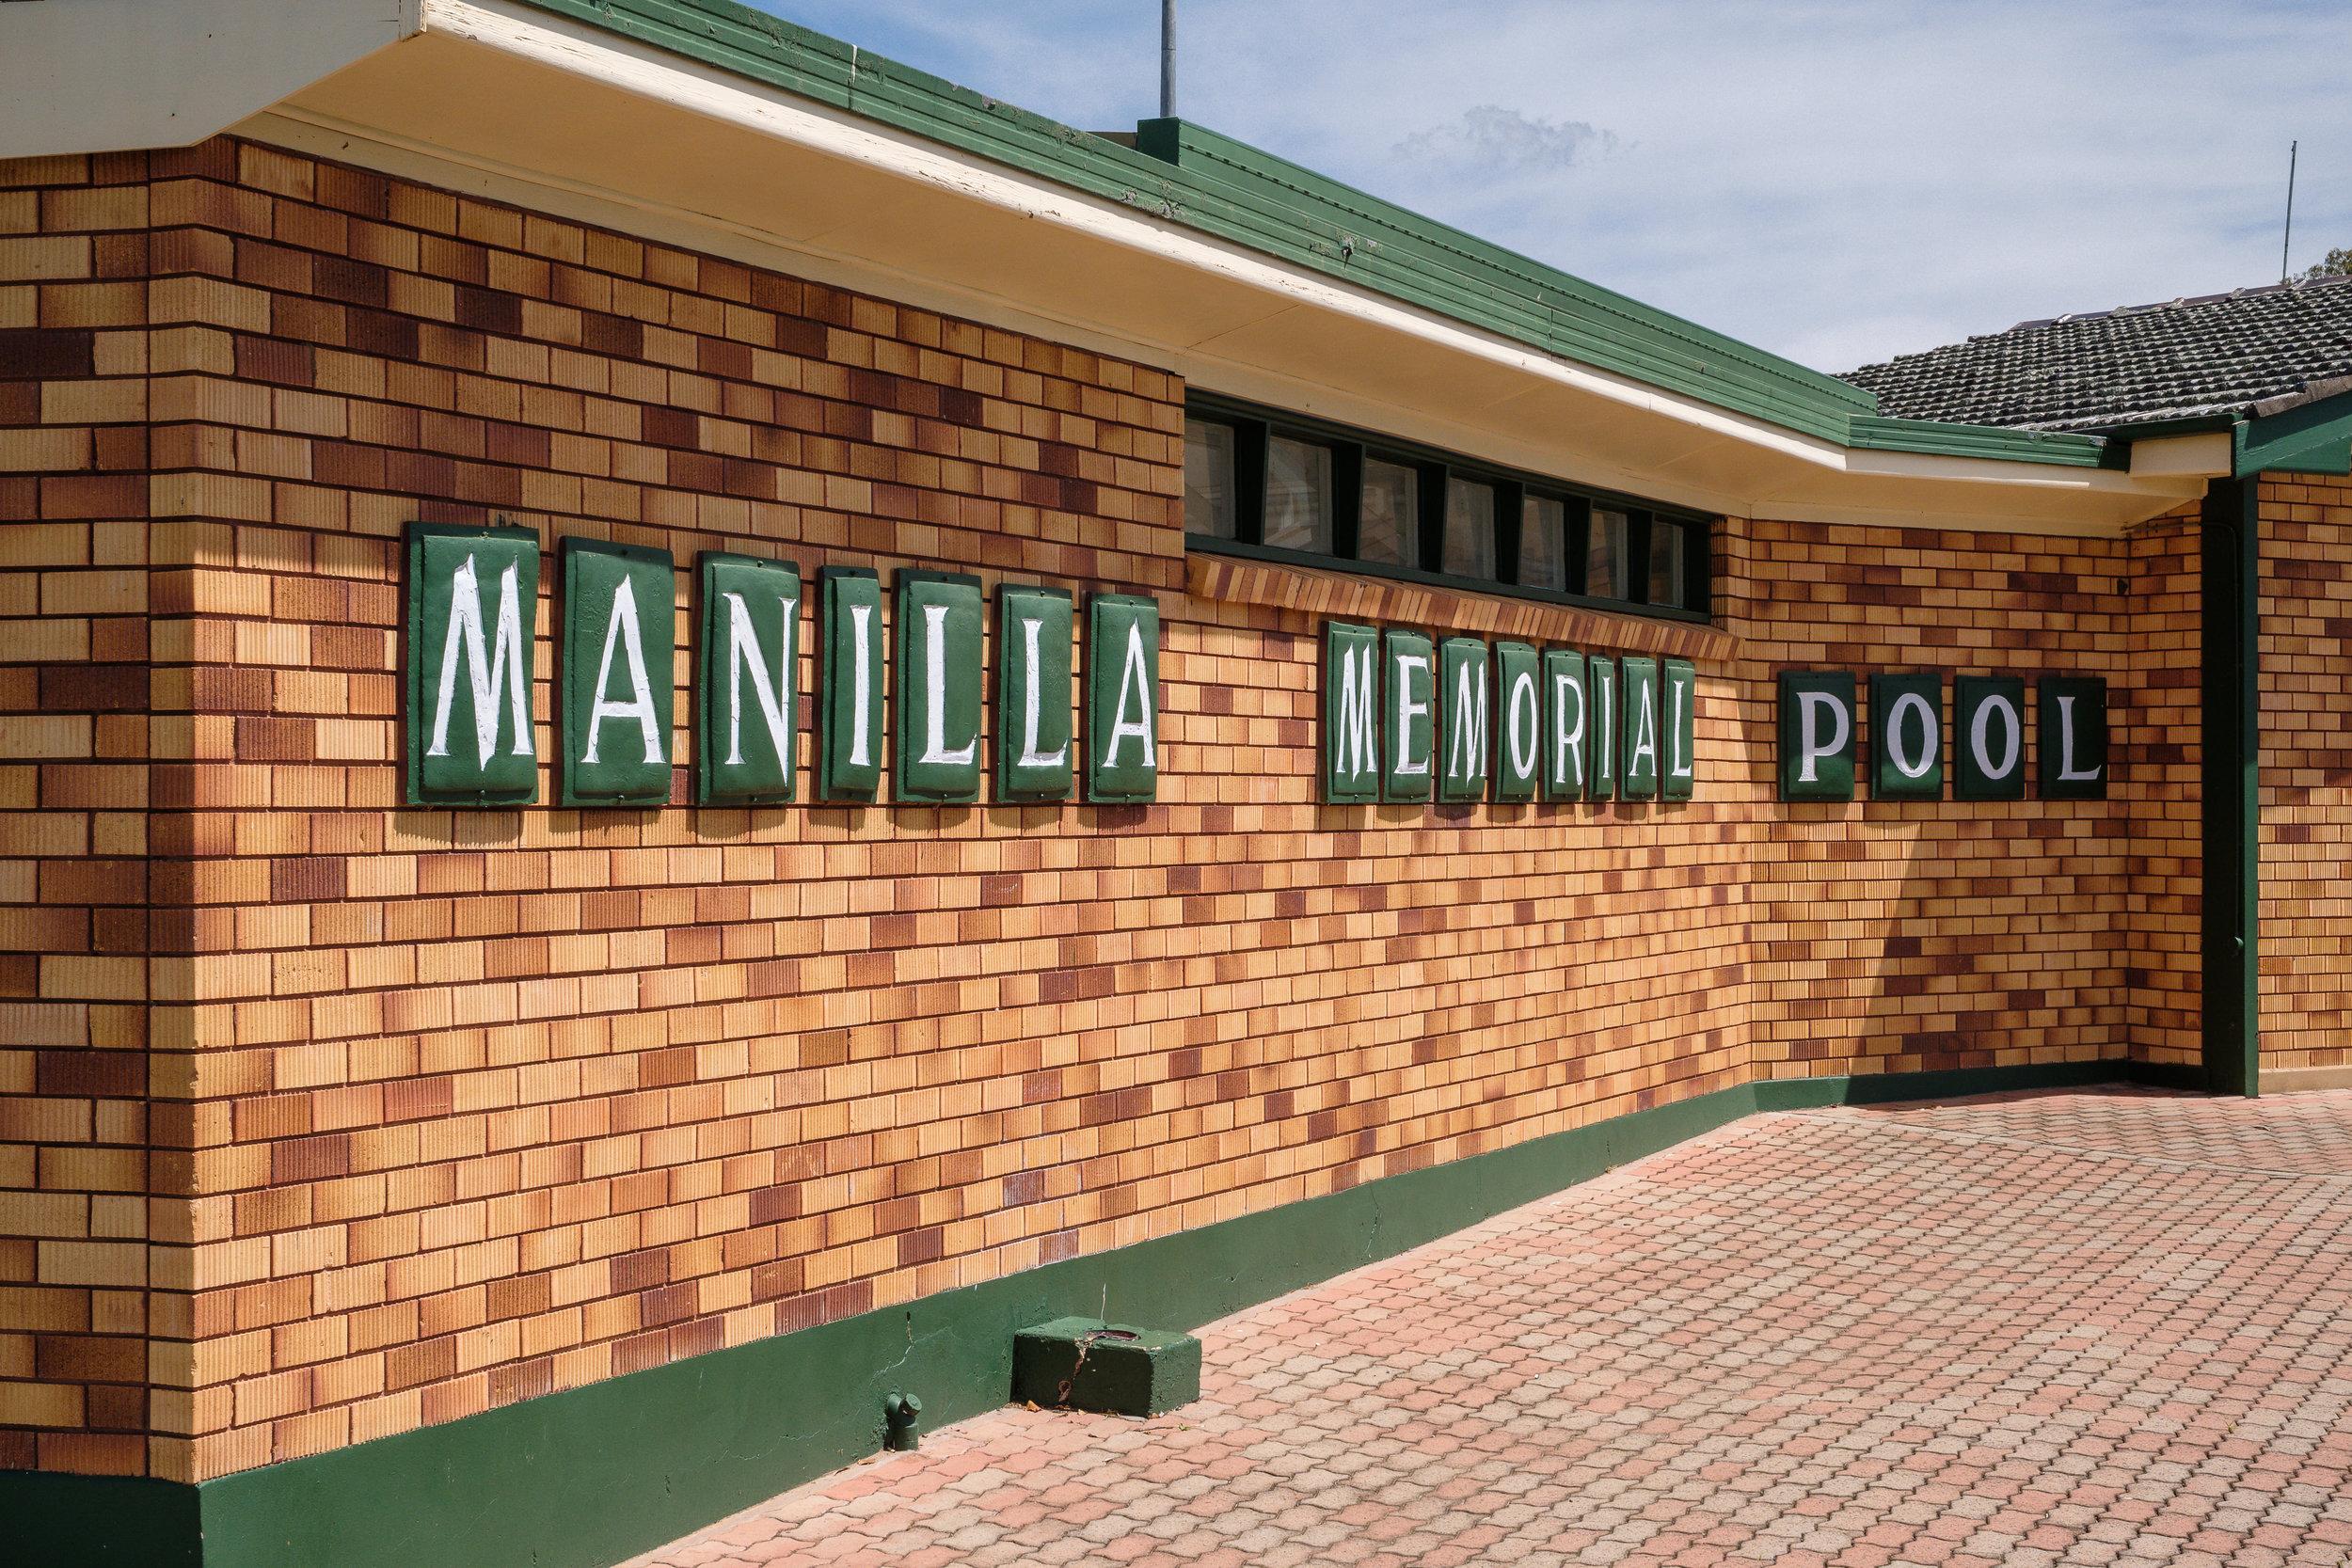 Manilla - Pool Outside.JPG